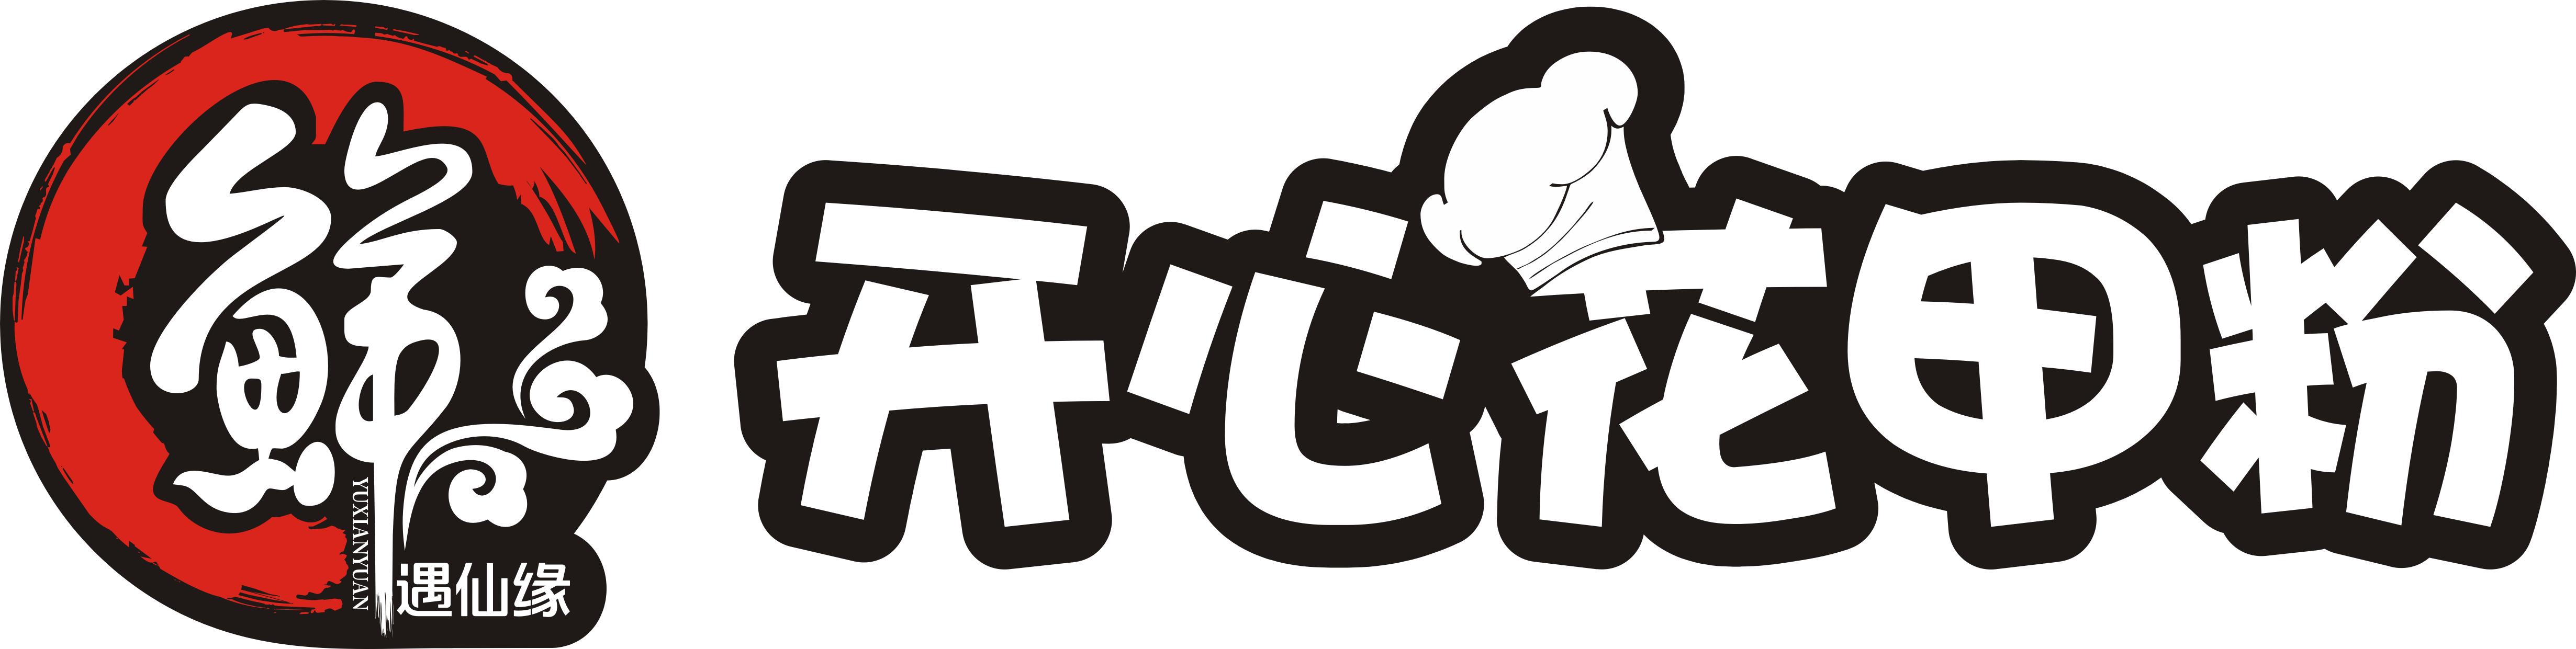 遇鲜缘logo.png